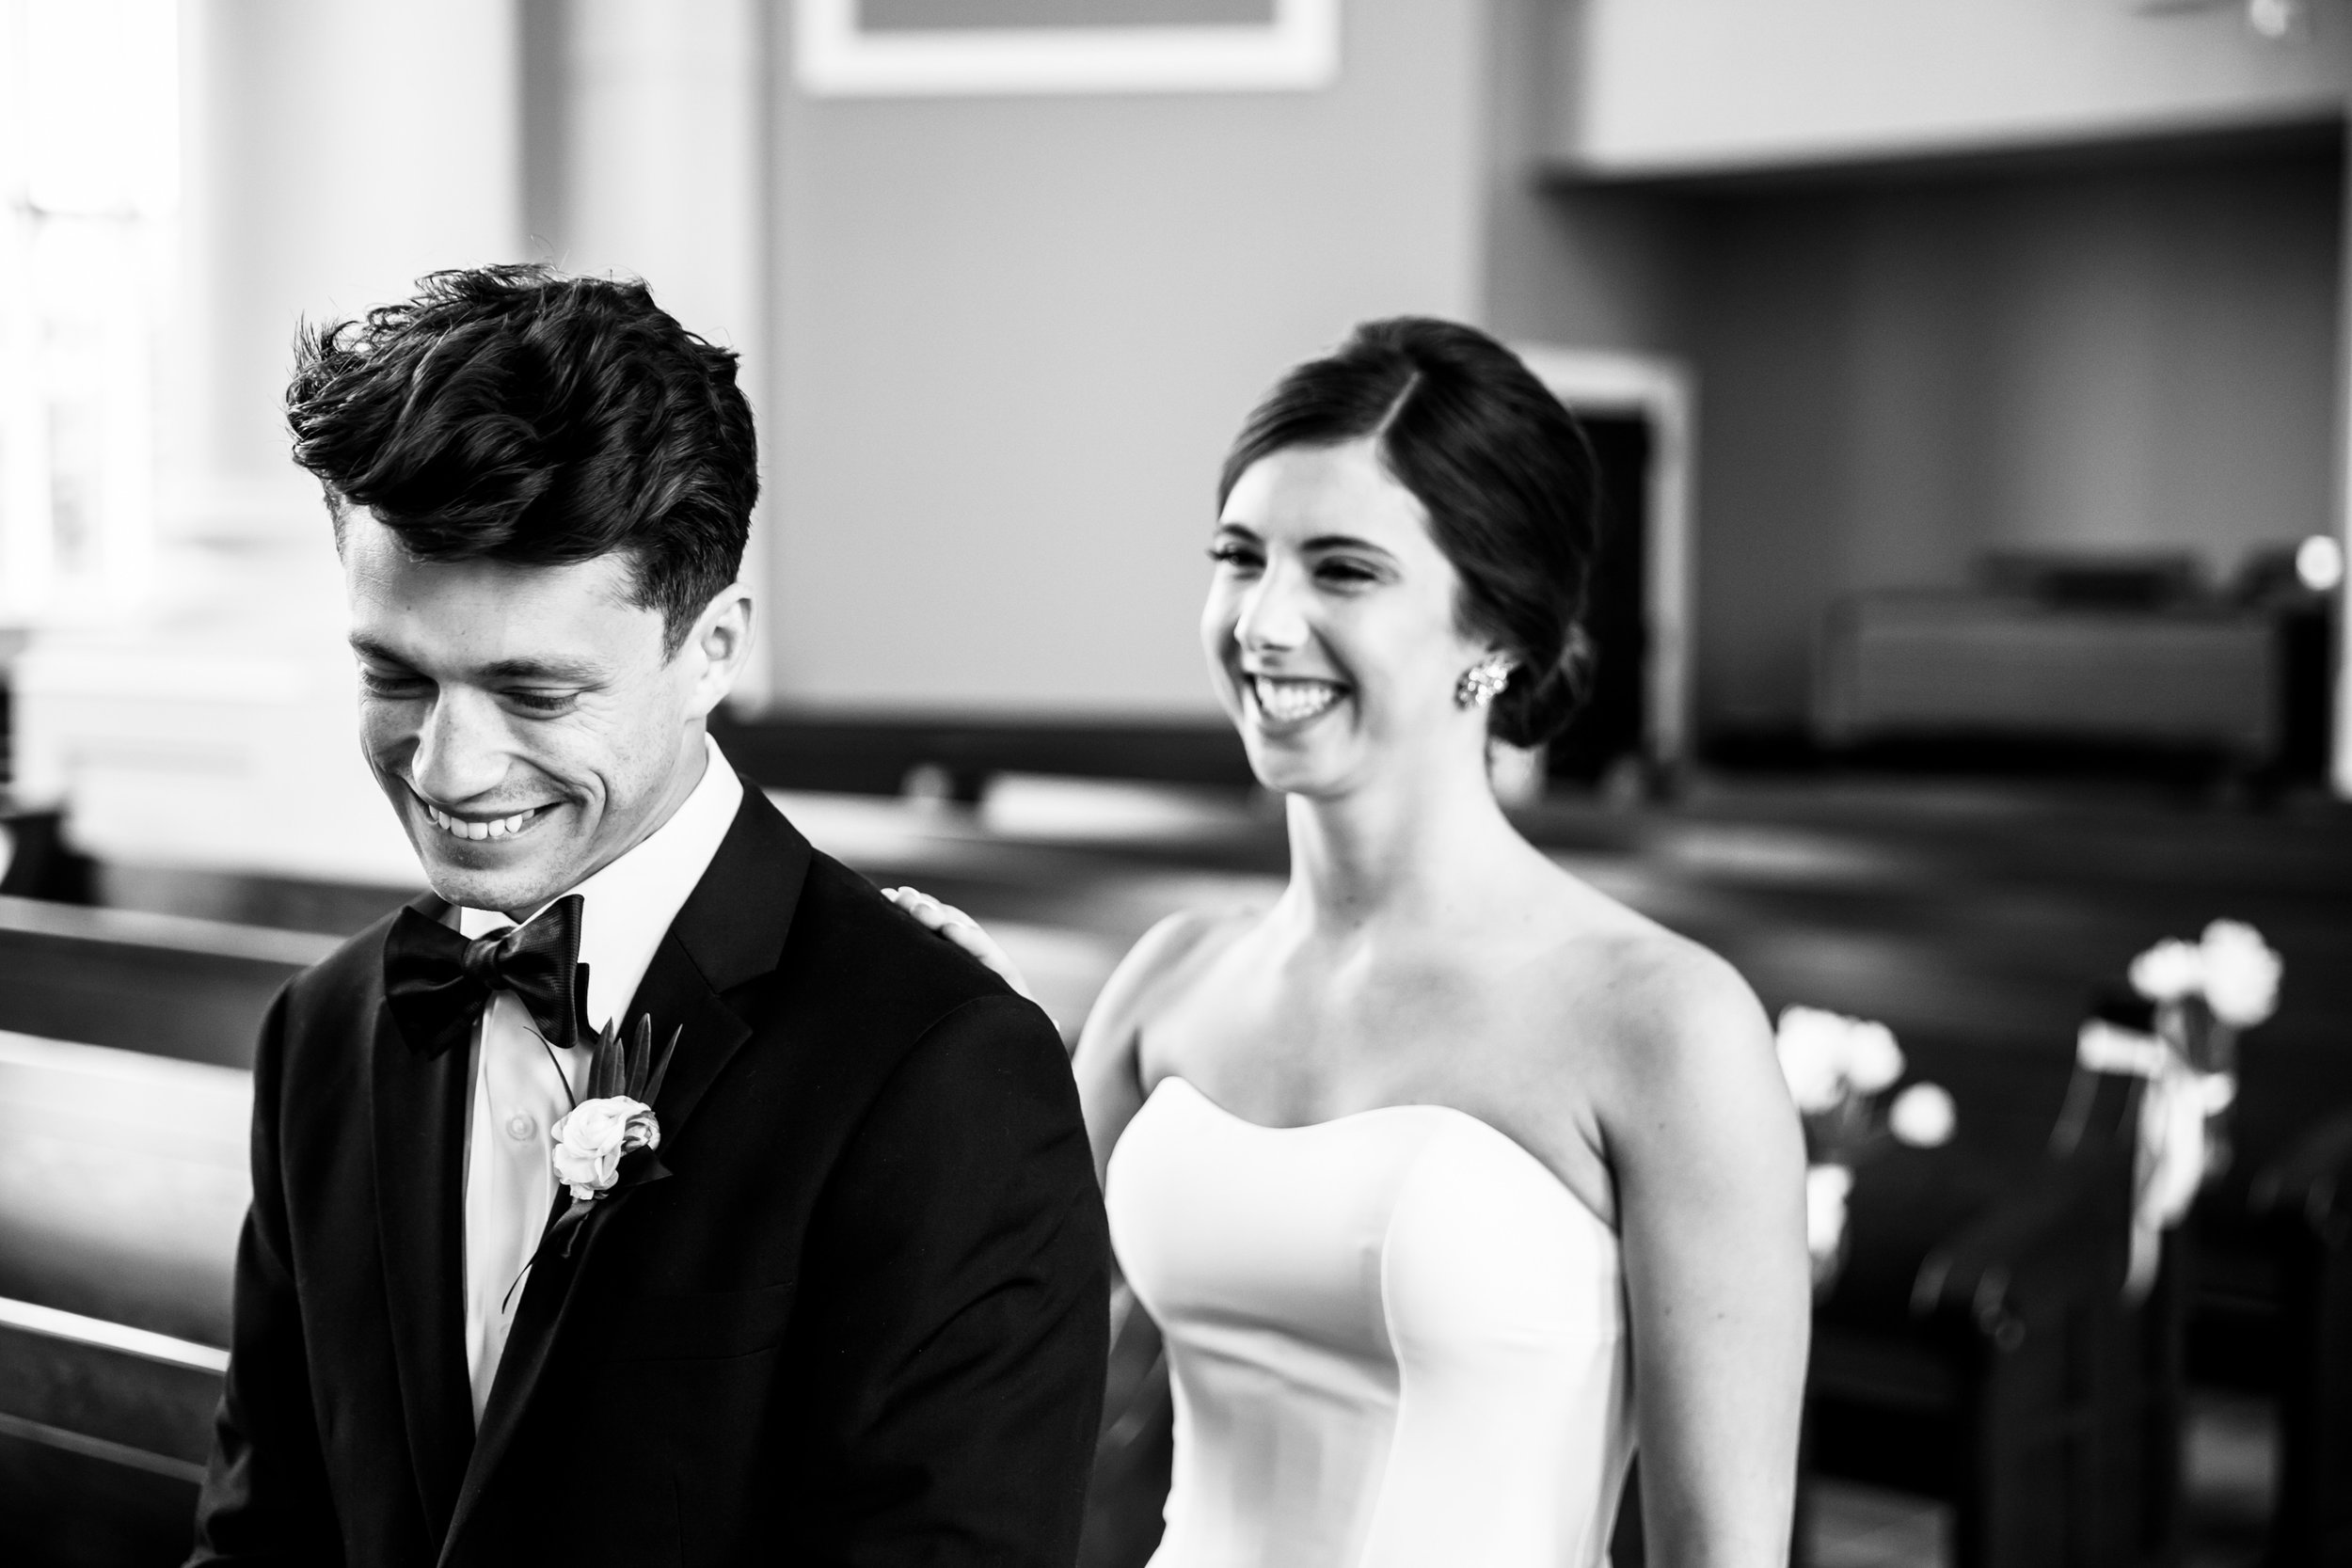 Brass on Baltimore_Kindling Wedding Photography_2.JPG